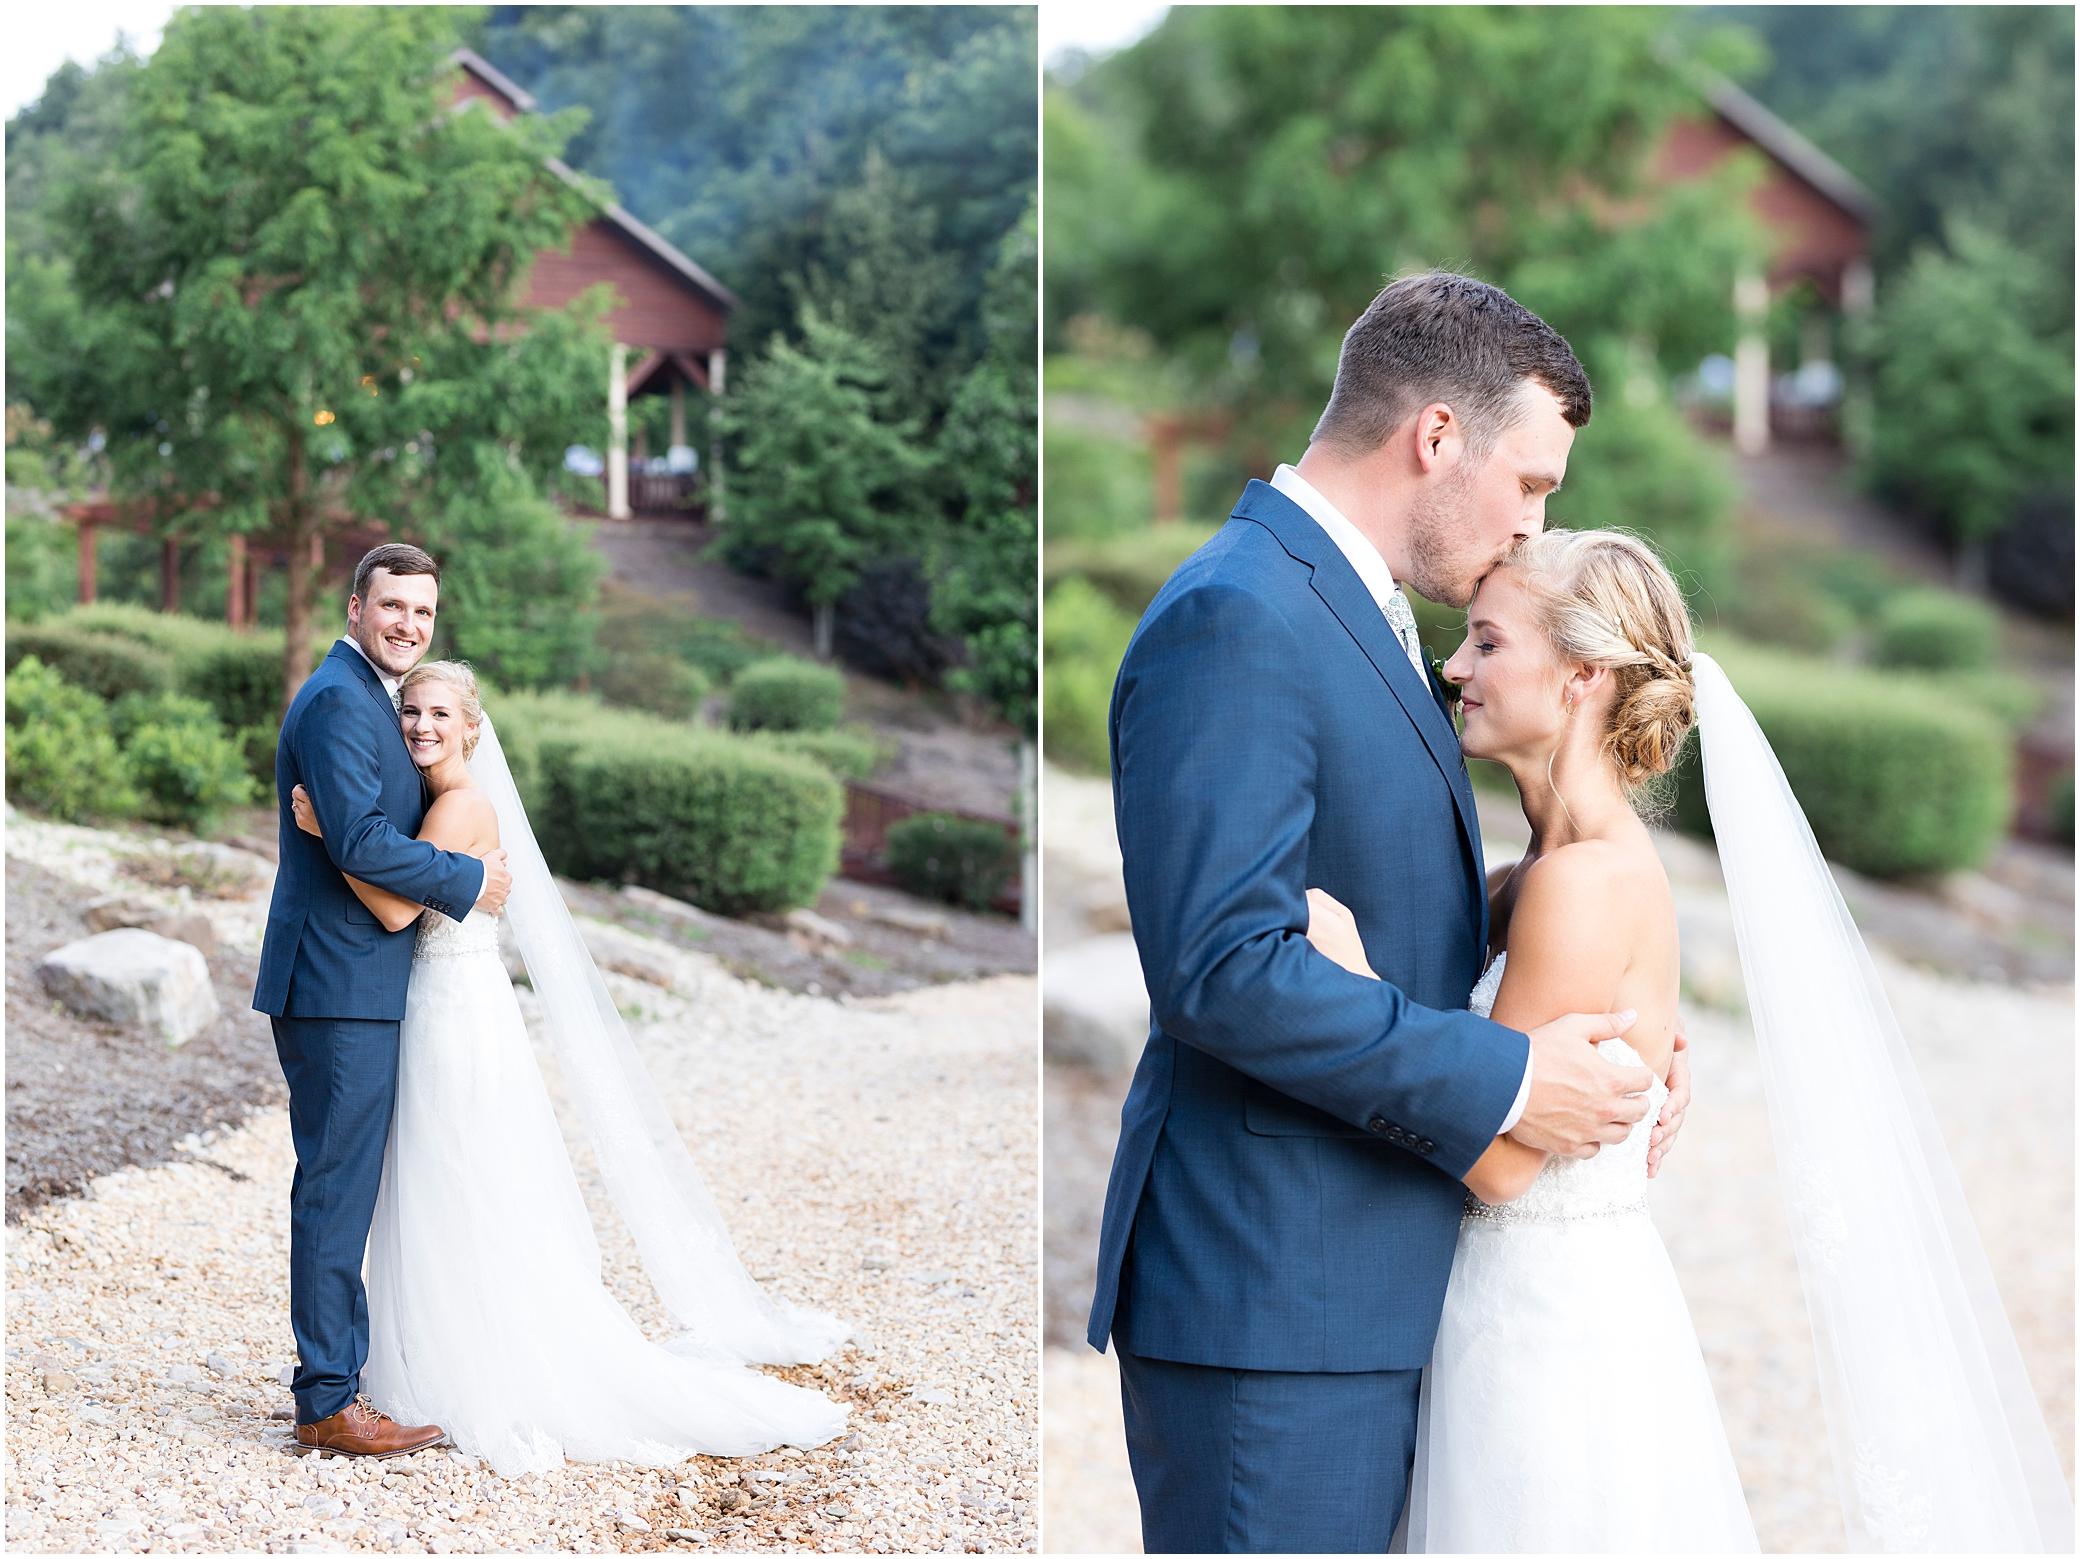 House Mountain Inn Wedding, Virginia wedding in the mountains, bride and groom portrait